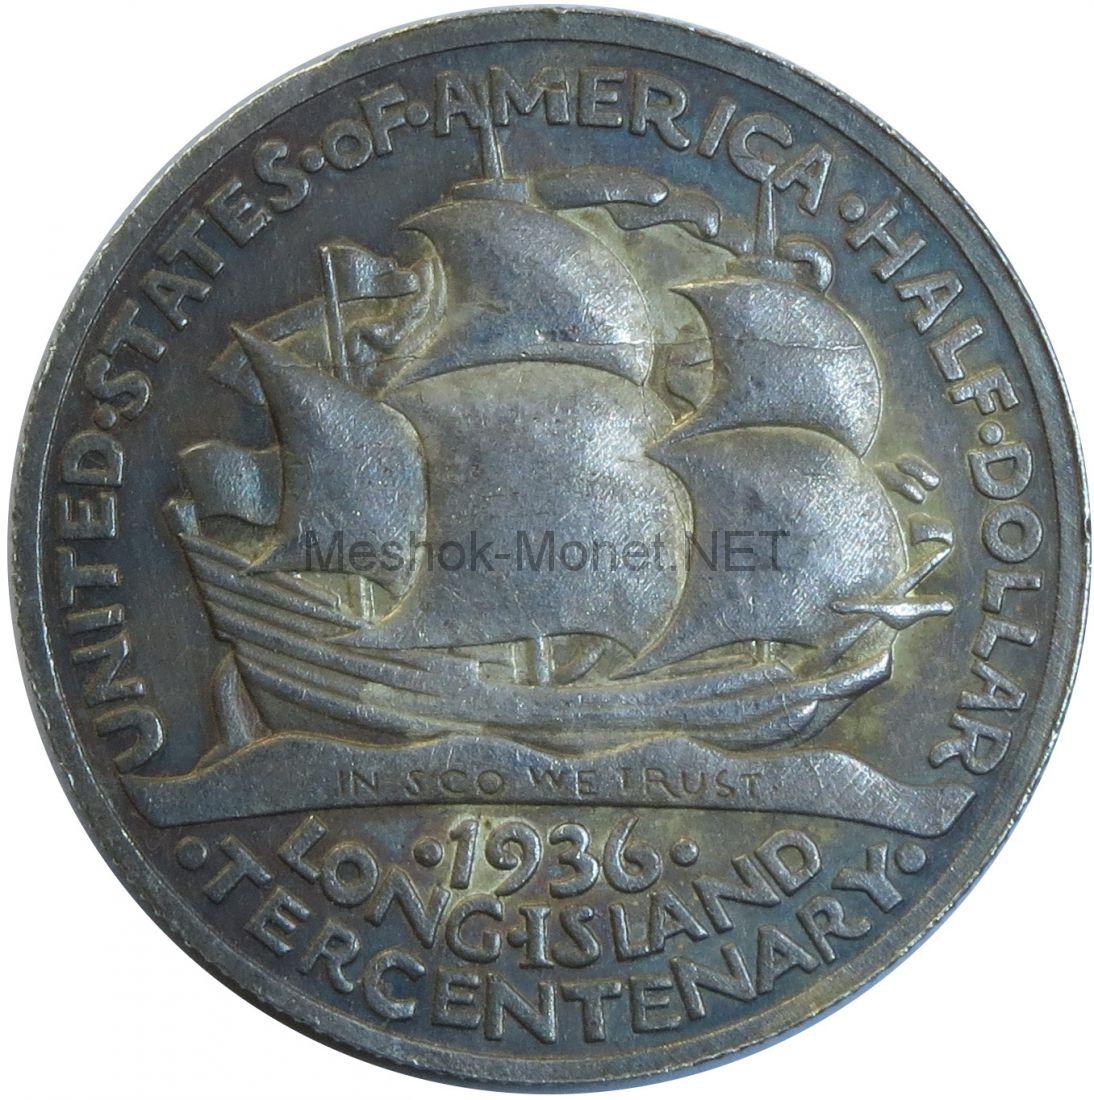 Копия 50 центов 1936 года фрегат